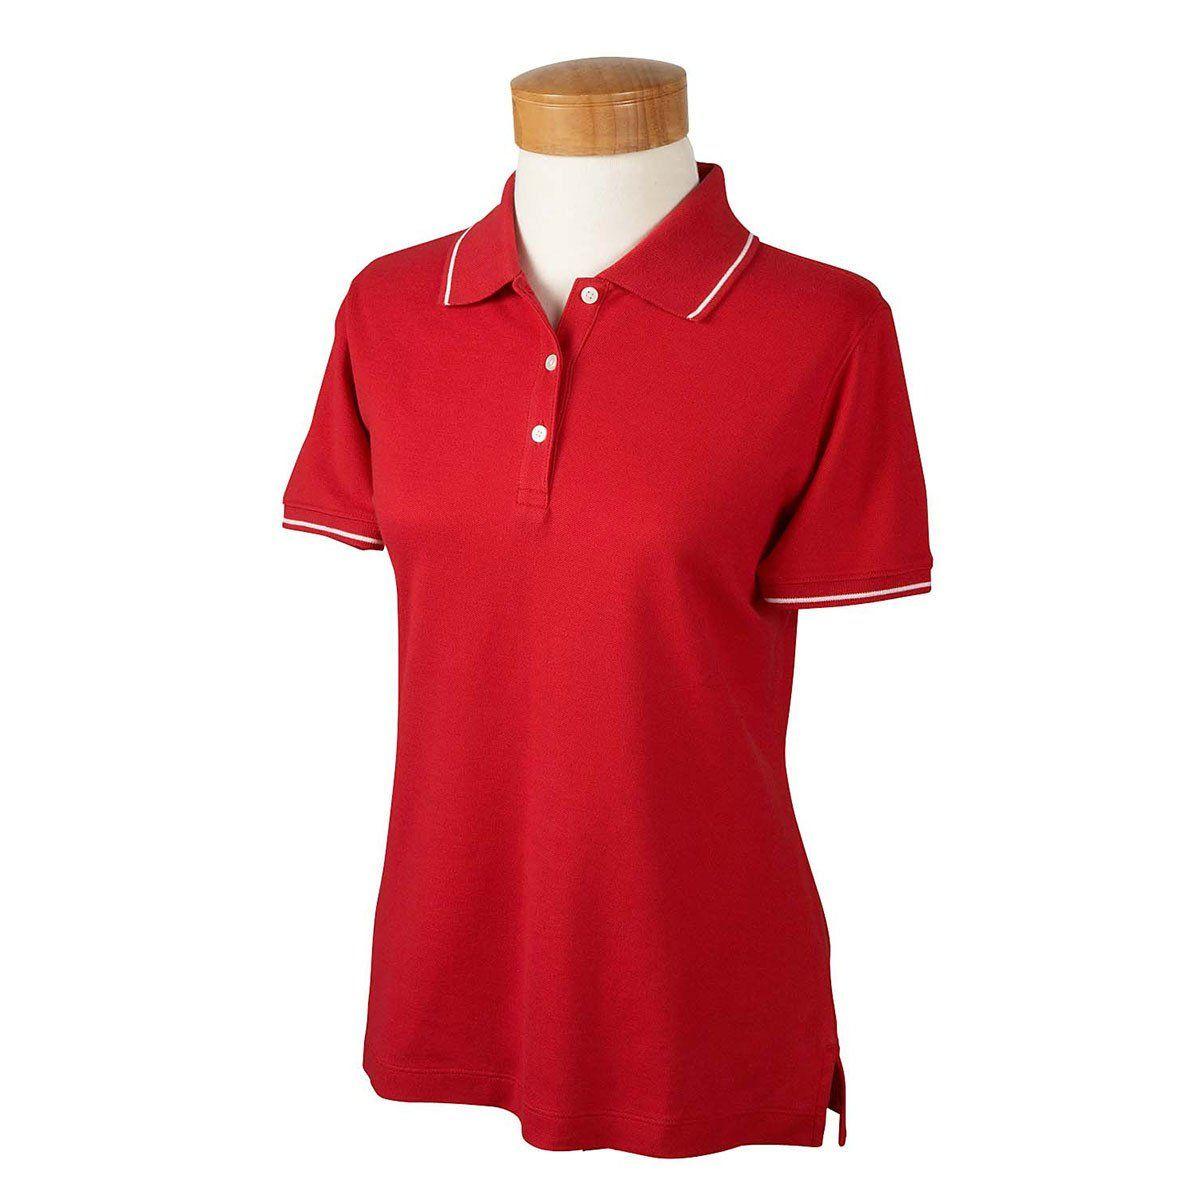 Devon Jones Women S Red White Pima Pique Short Sleeve Tipped